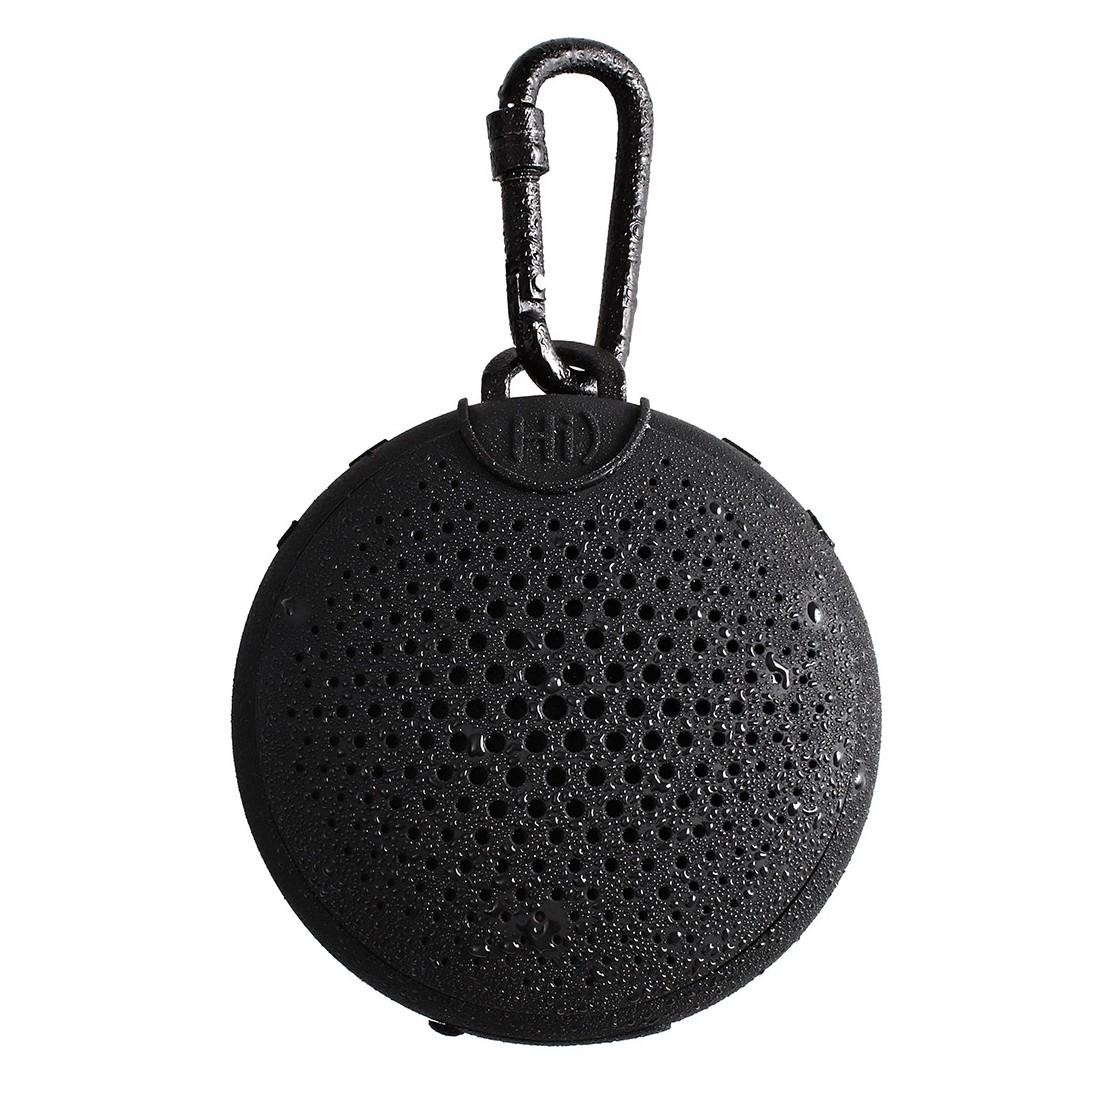 Altavoz Portátil - Boompods ABBLK Aquablaster, Alexa, Blanco